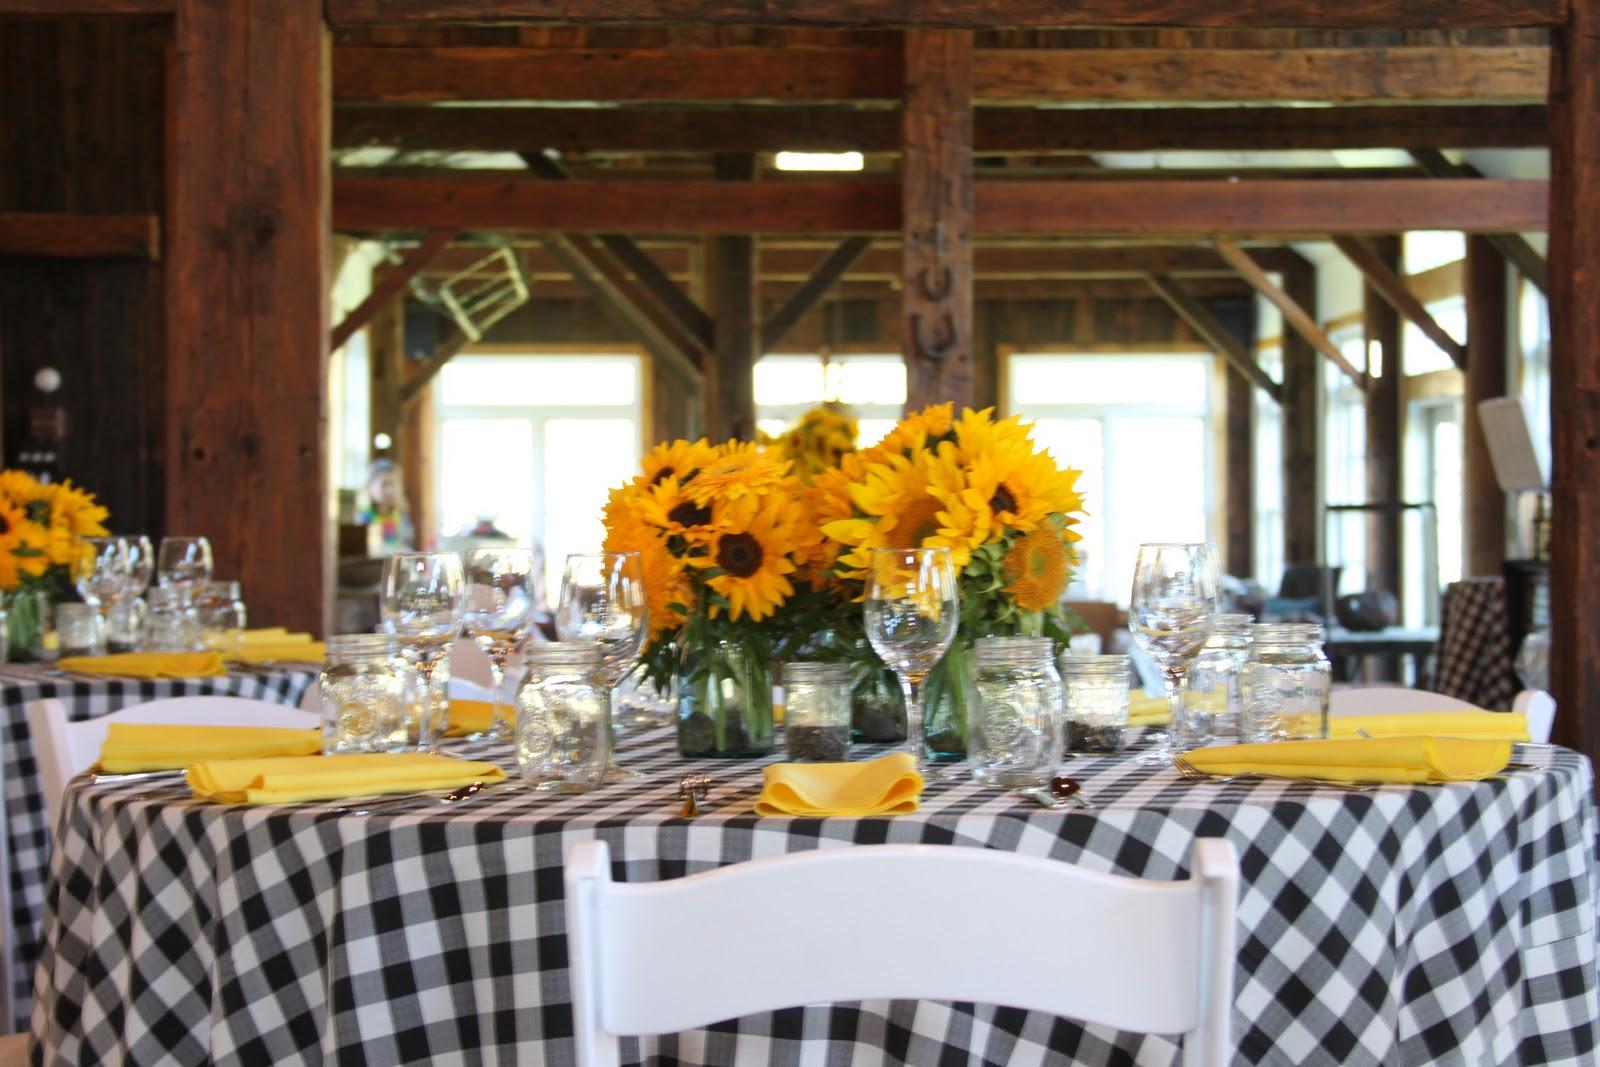 Fan no farmhouse wedding decor